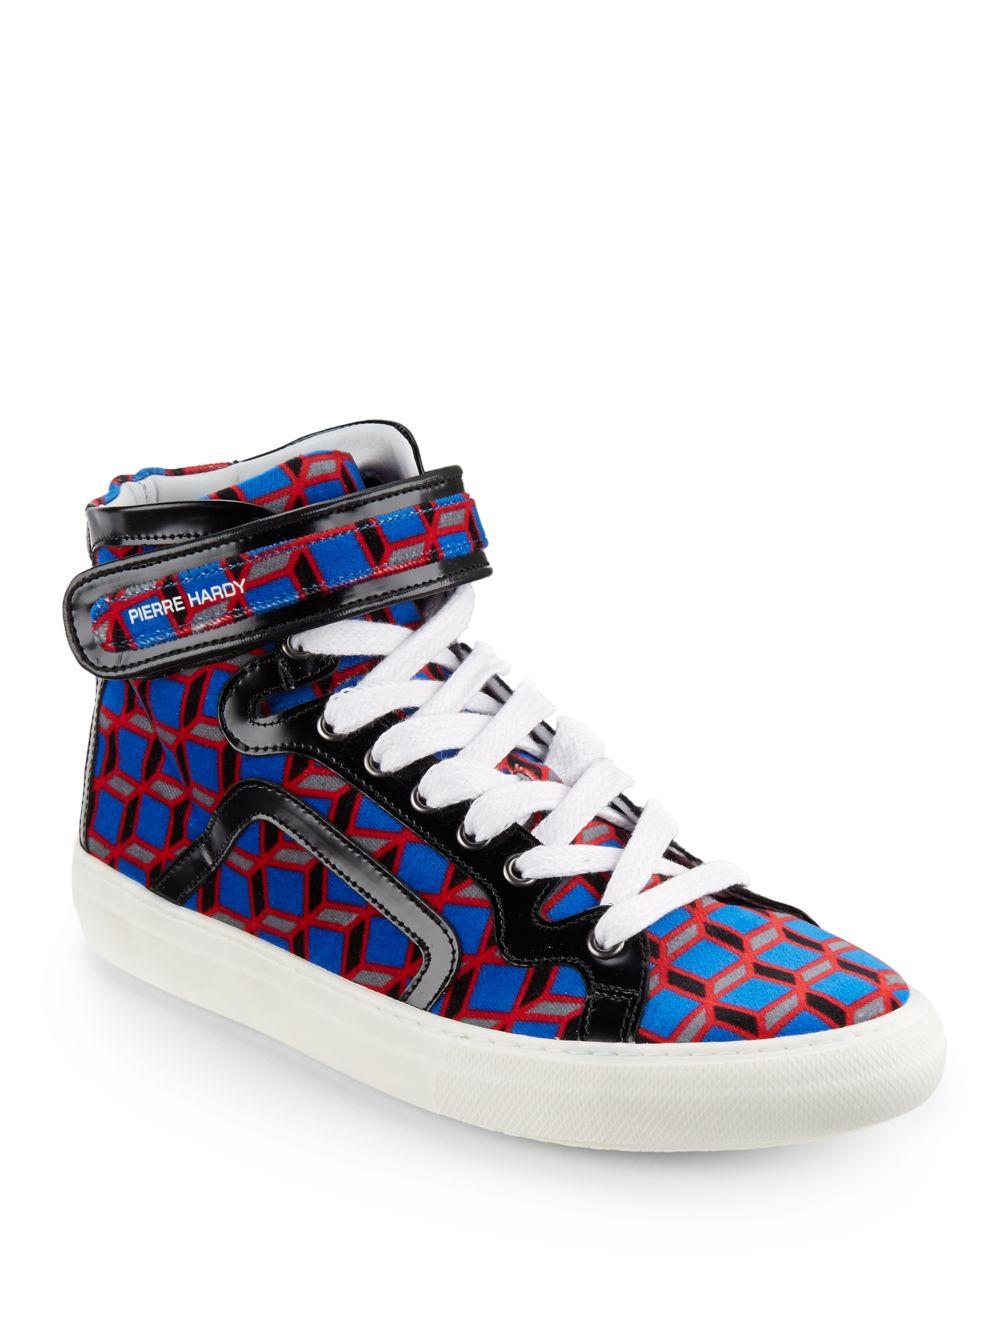 pierre hardy geometricprint denim hightop sneakers in blue for men red black lyst. Black Bedroom Furniture Sets. Home Design Ideas